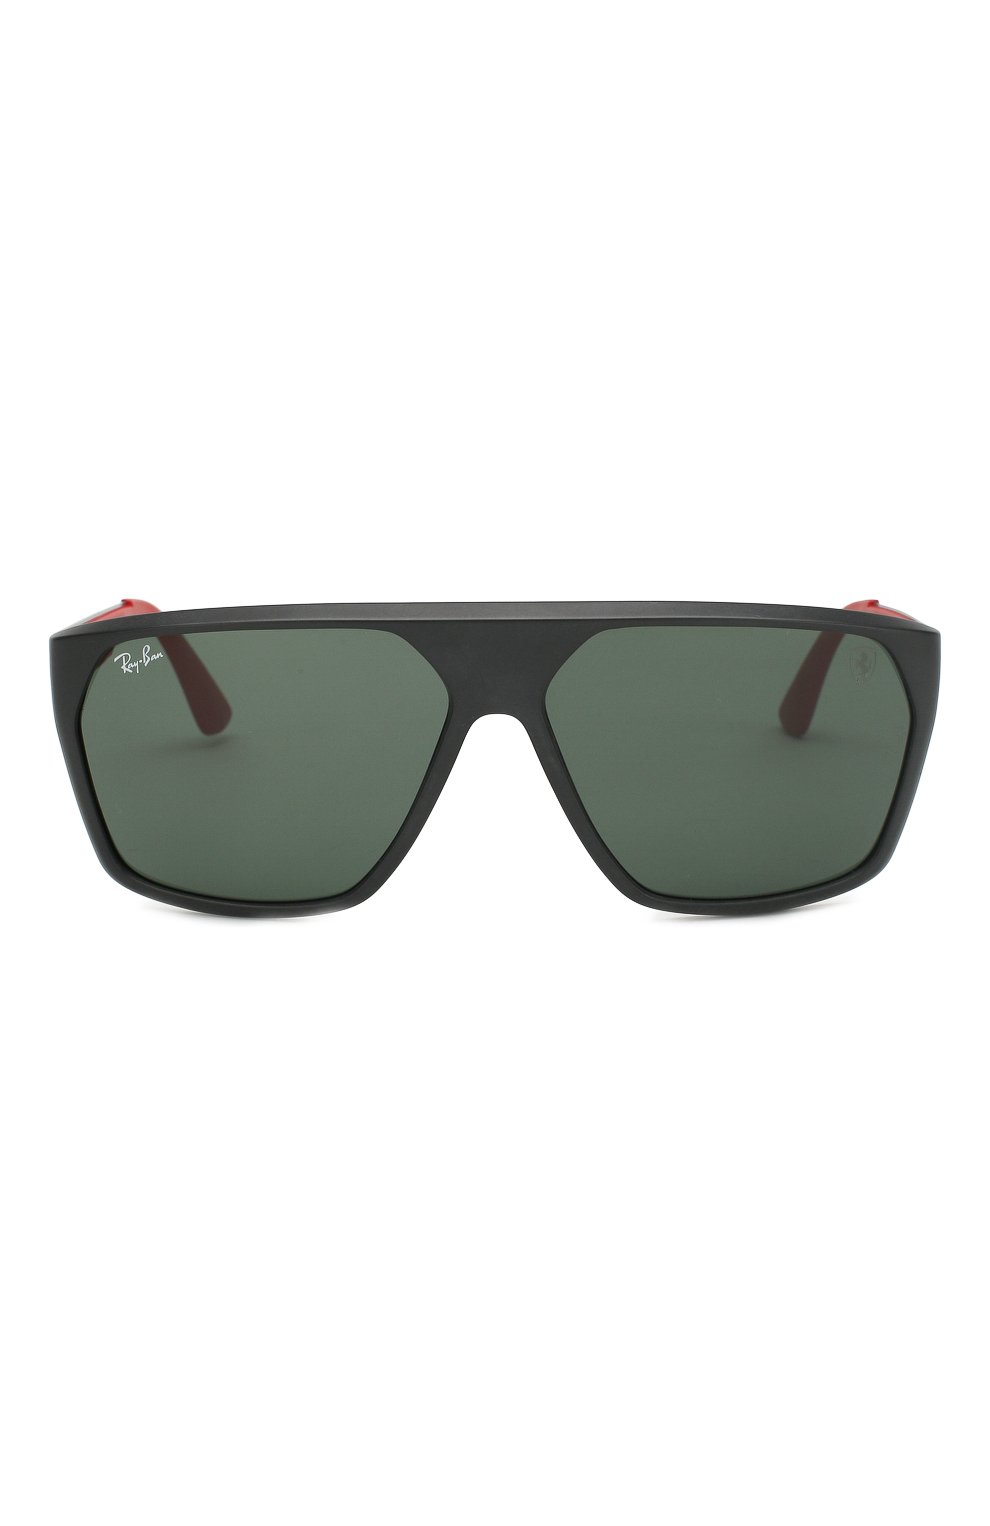 Мужские солнцезащитные очки RAY-BAN черного цвета, арт. 4309M-F60271 | Фото 2